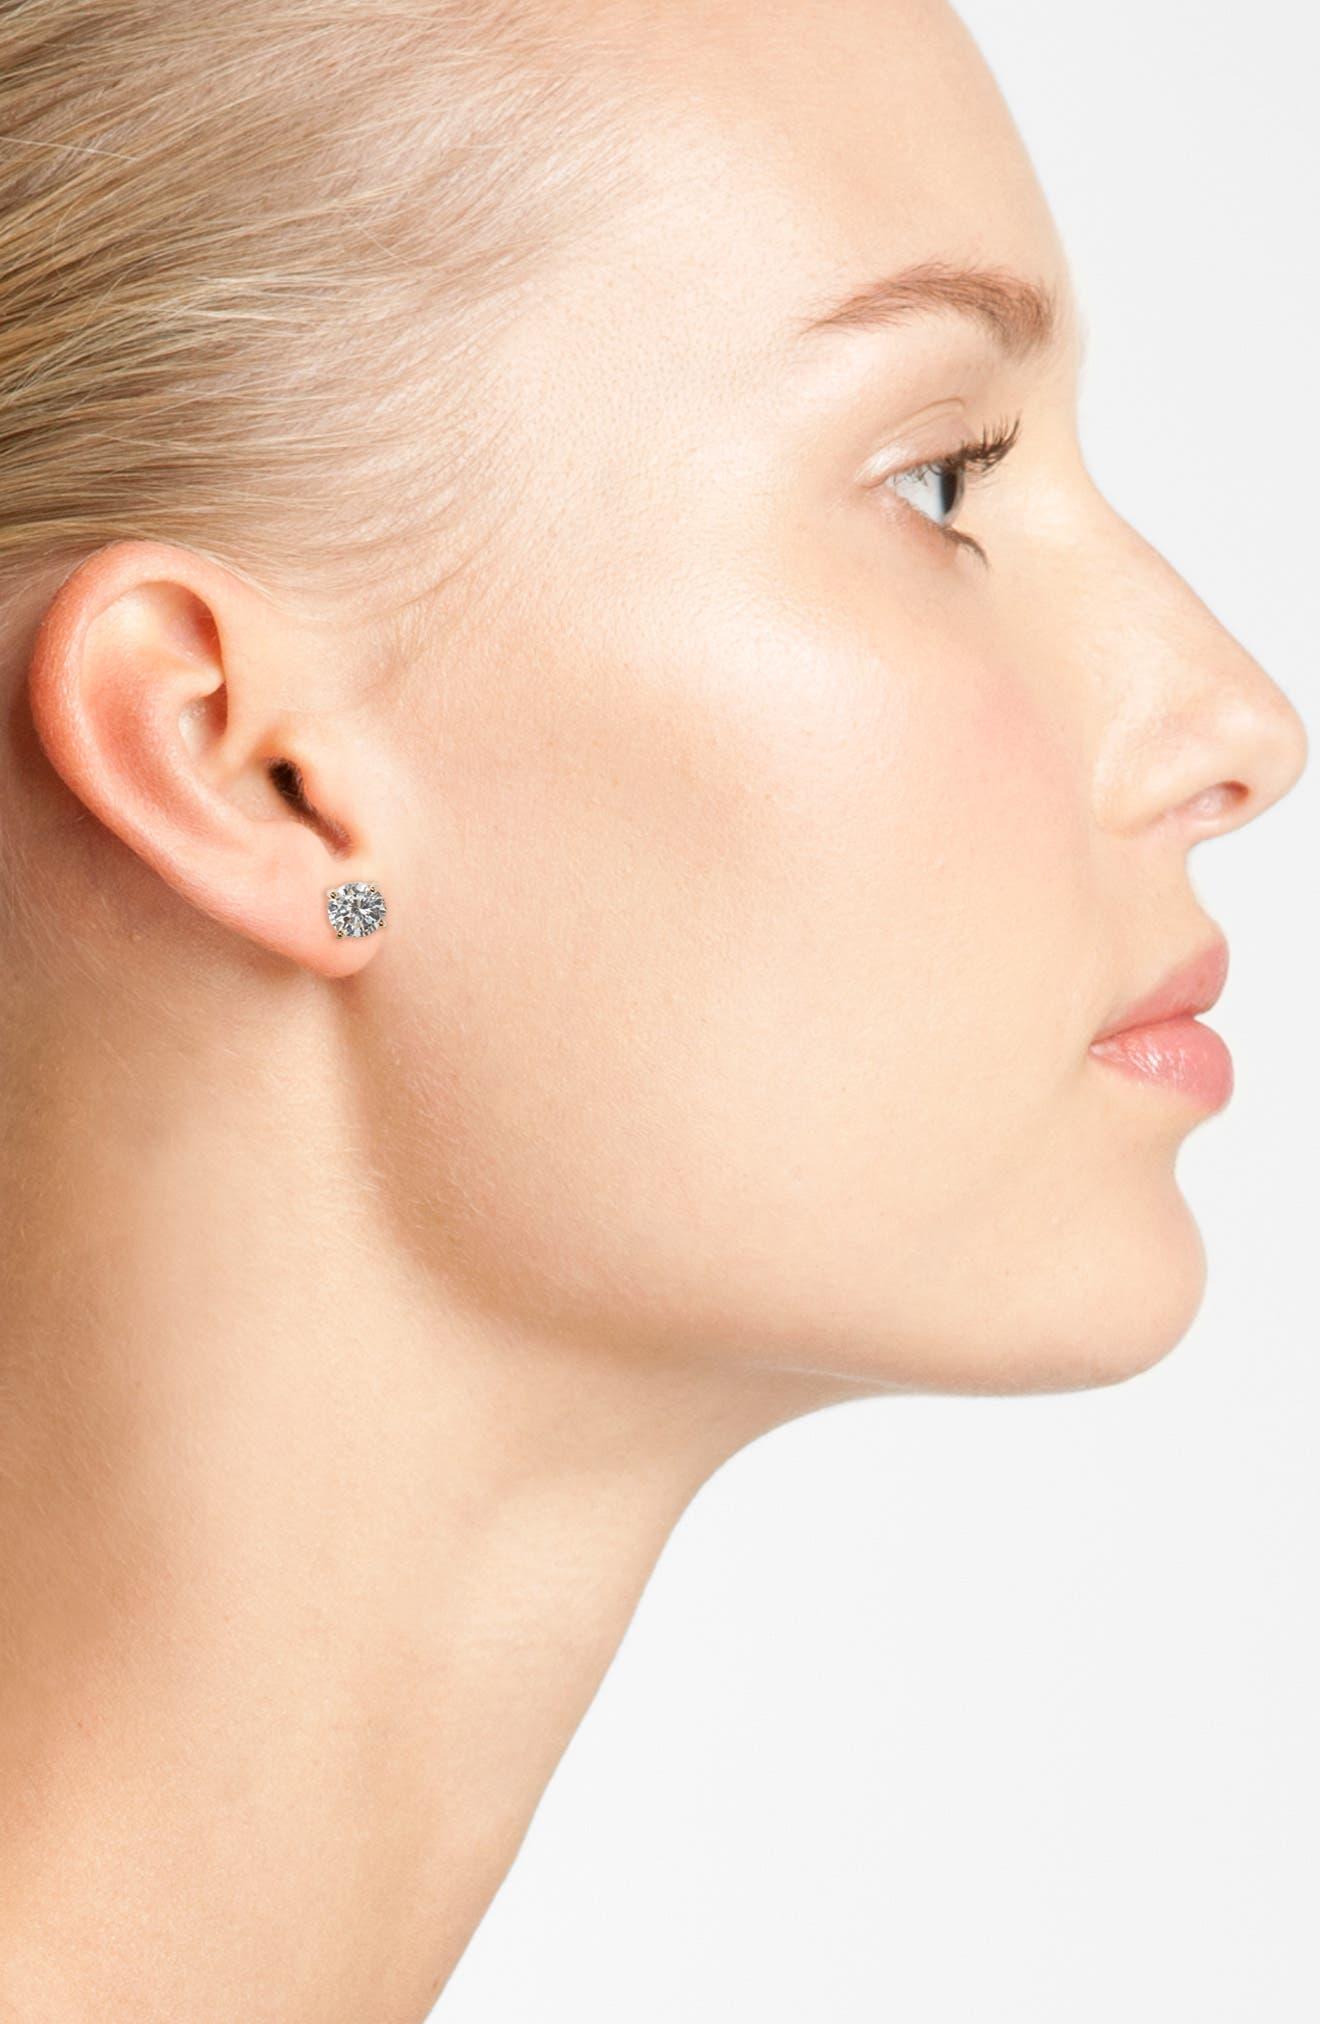 Cubic Zirconia Stud Earrings,                             Alternate thumbnail 2, color,                             710